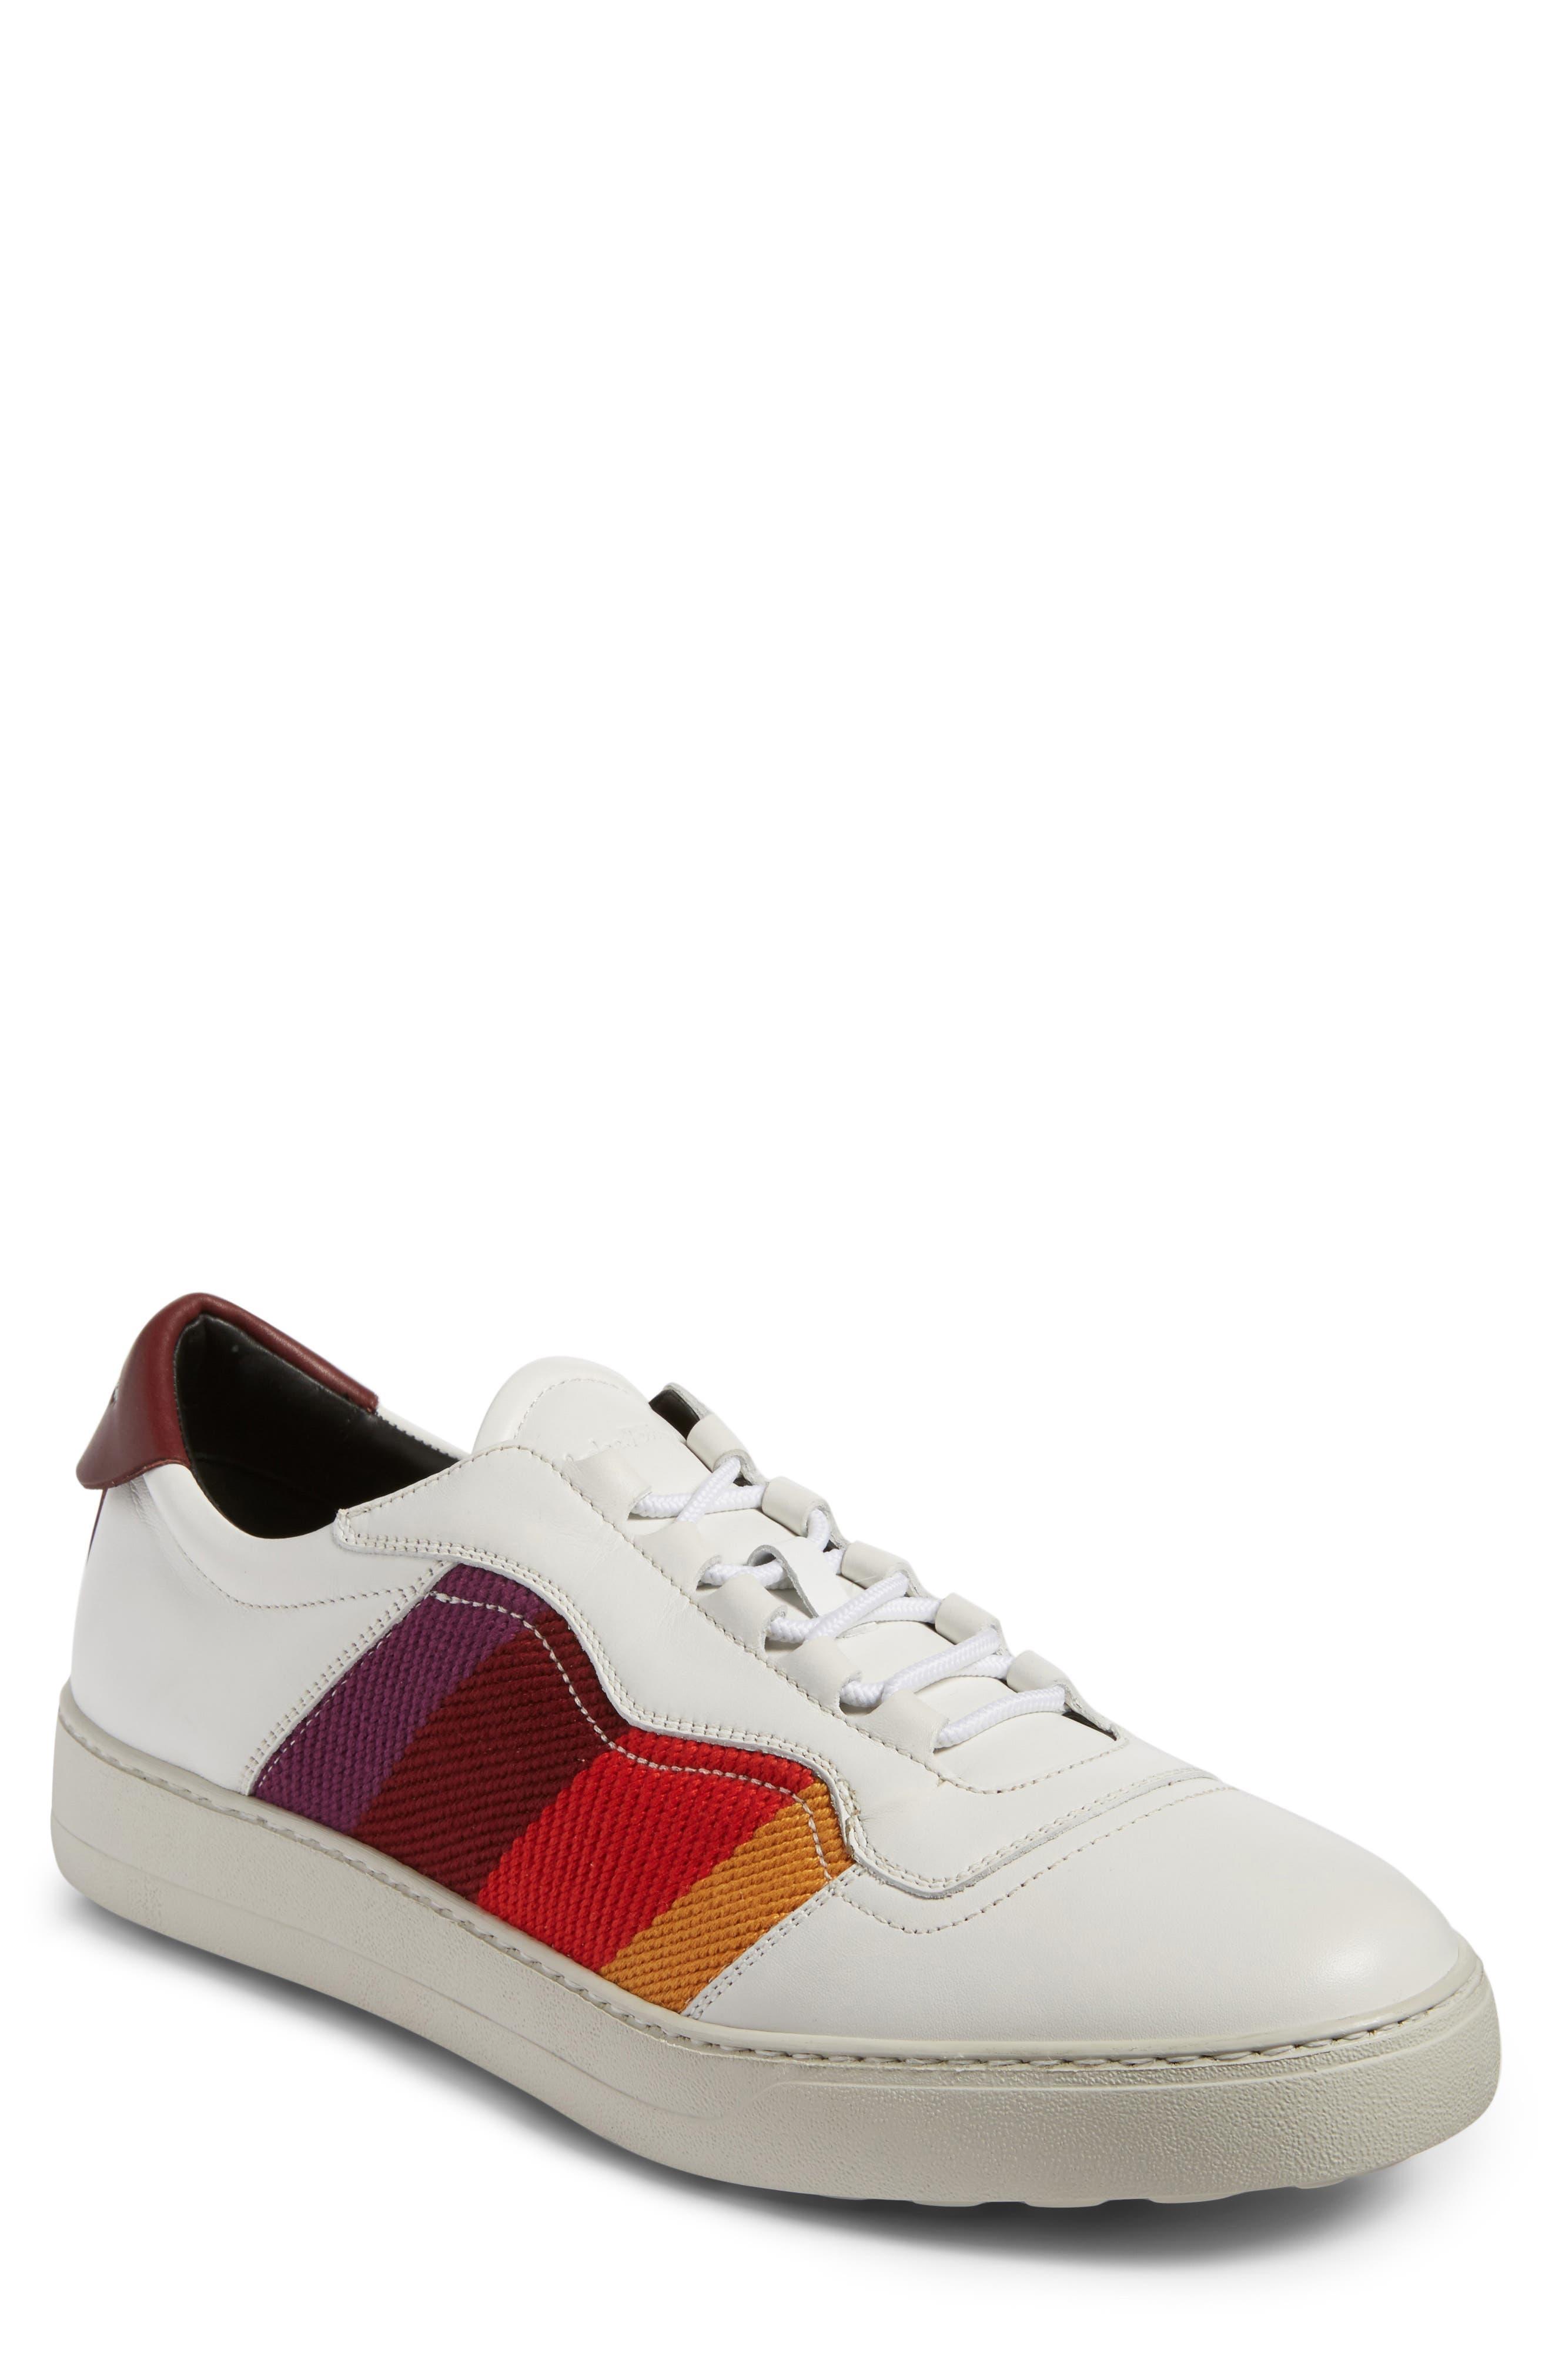 Alternate Image 1 Selected - Salvatore Ferragamo Sneaker (Men)